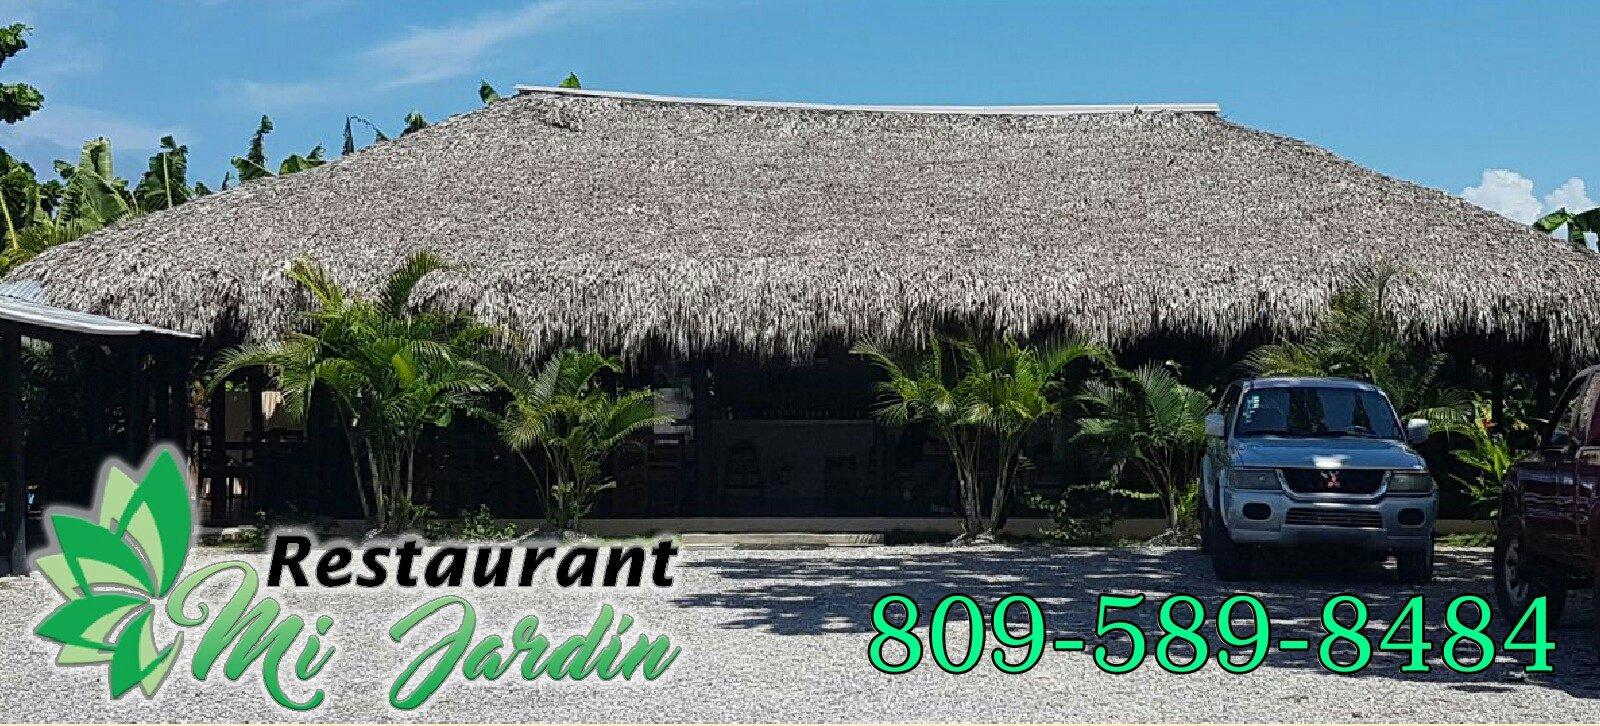 Mi jardin restaurant pizza steak house cabrera for Cafe jardin menu